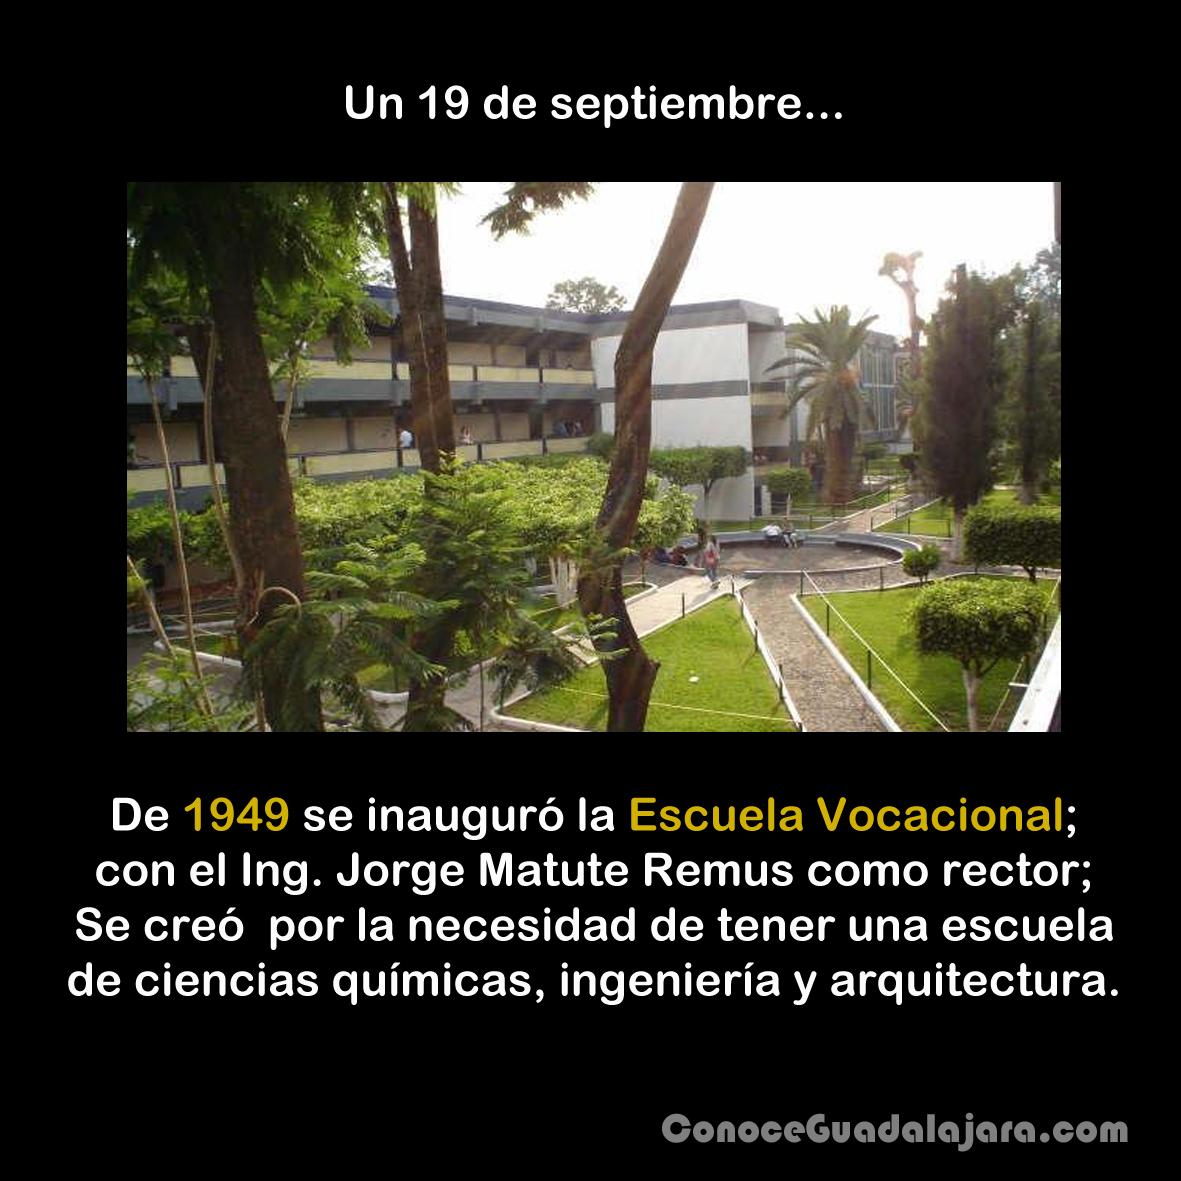 19-Septiembre-Inauguracion-Escuela-Vocacional